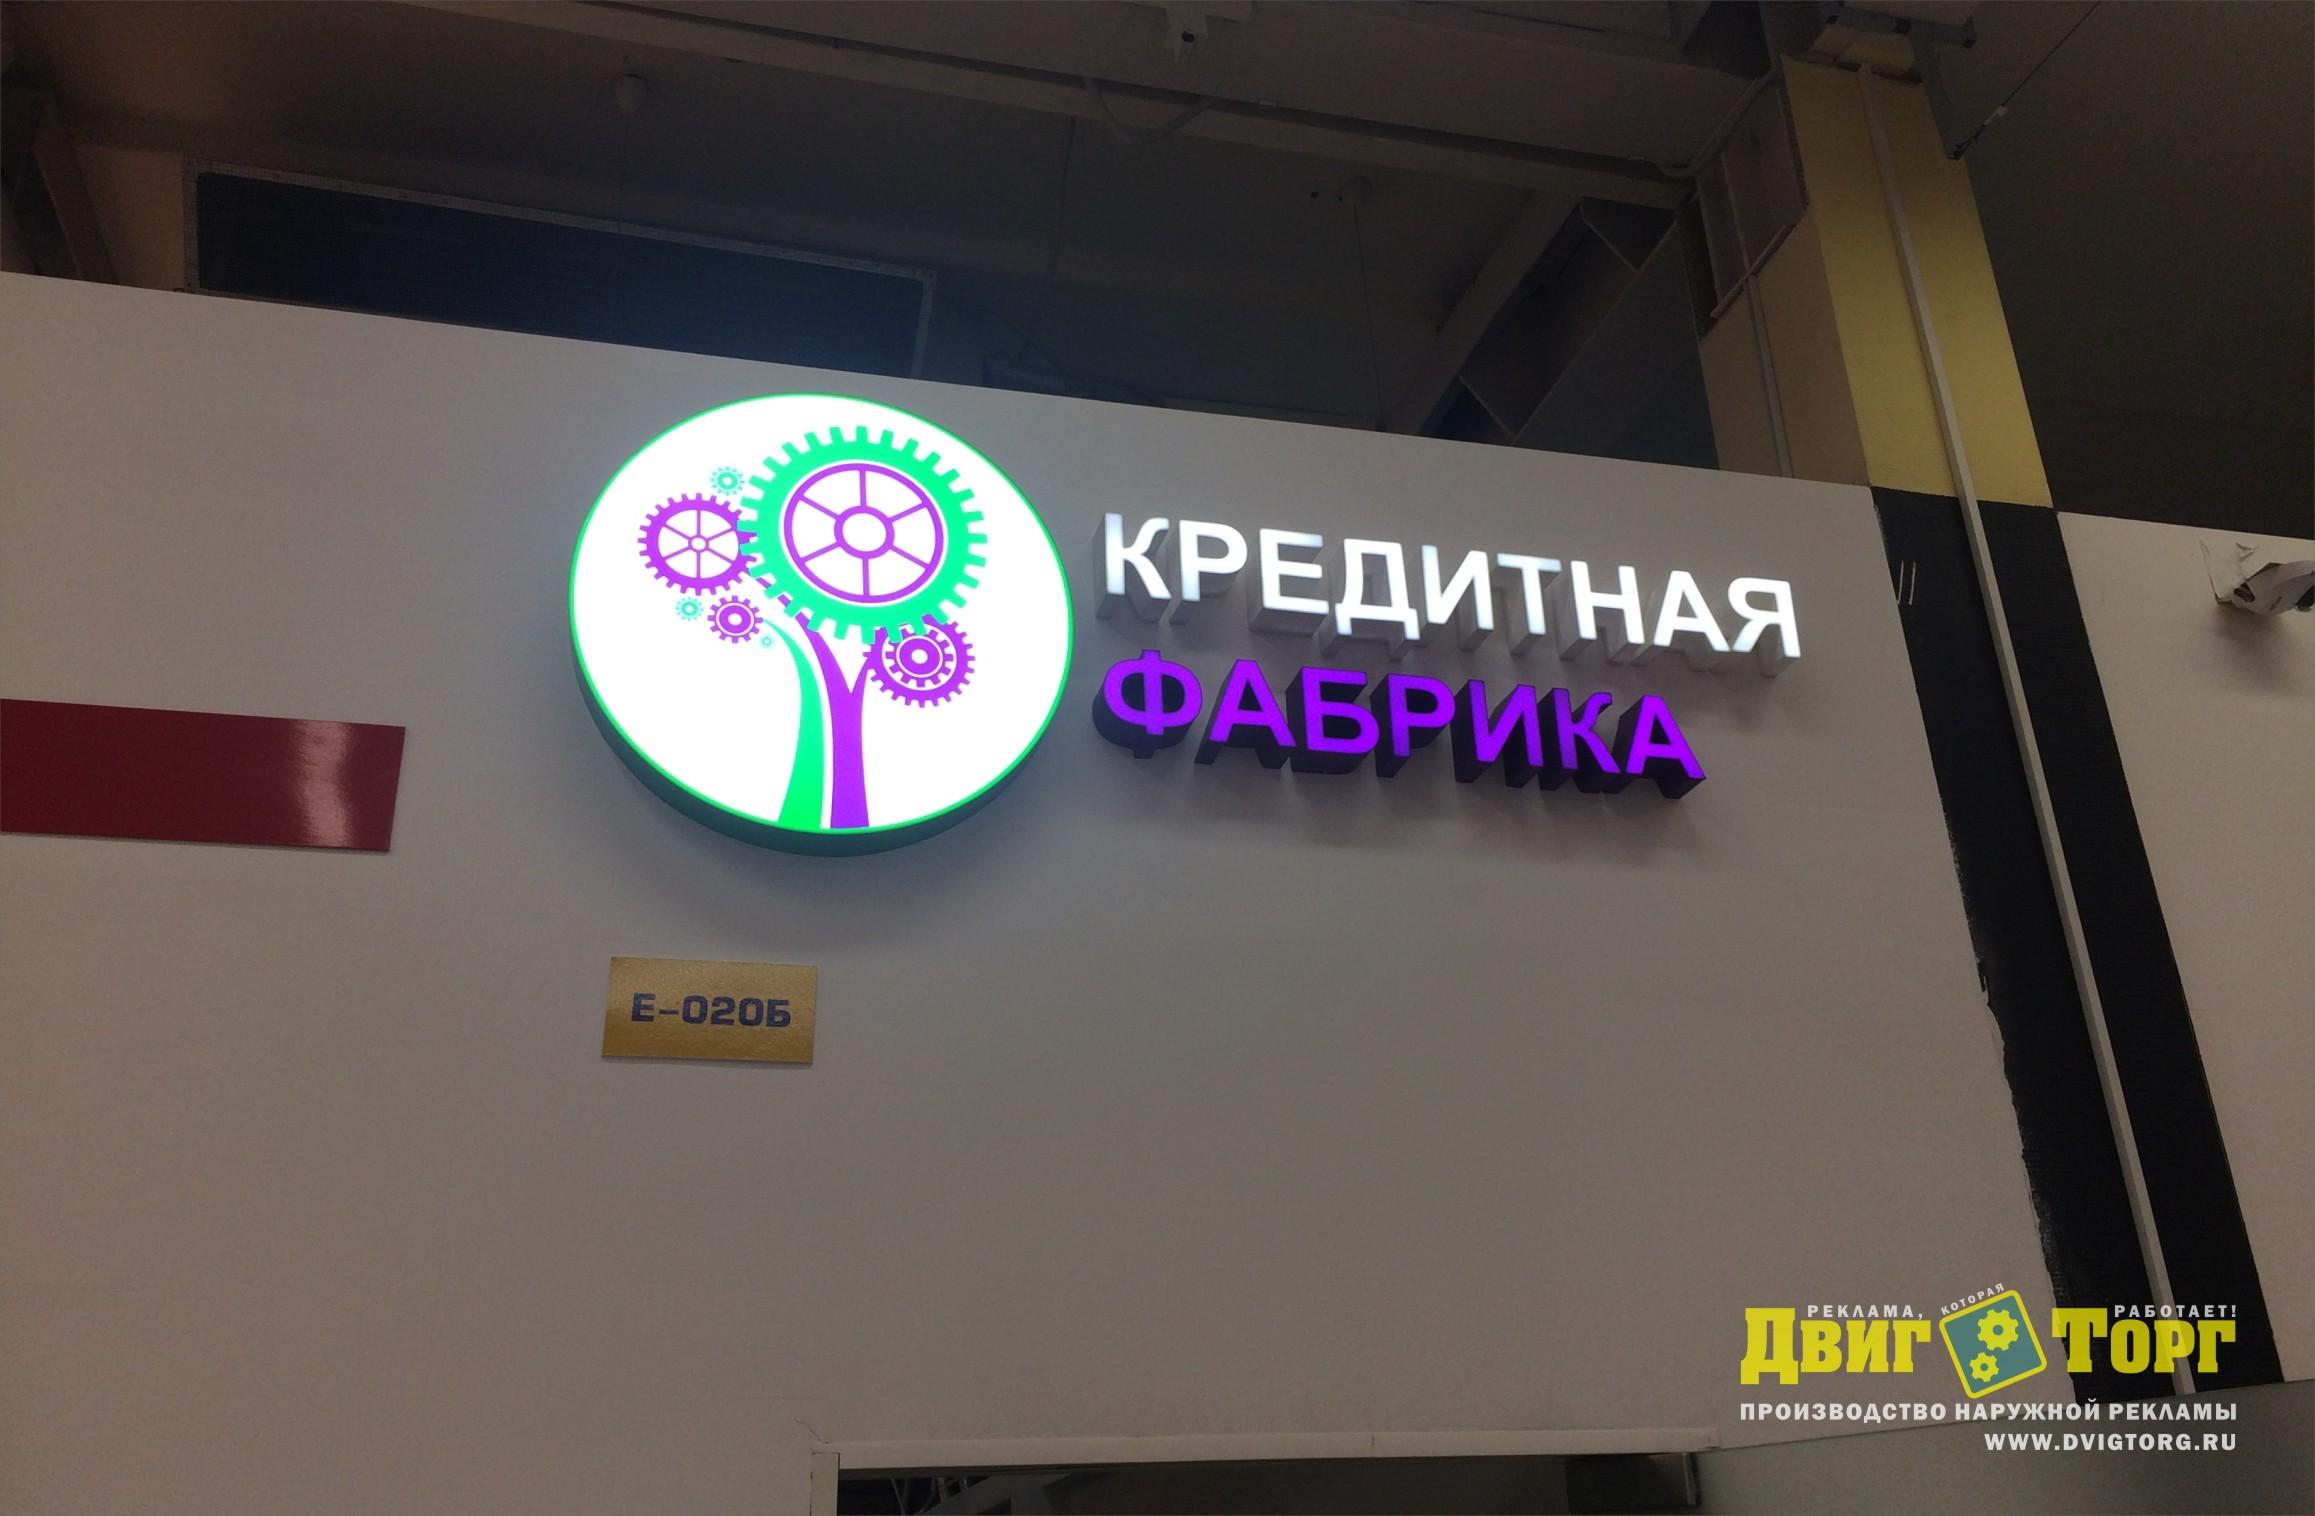 Кредитная фабрика